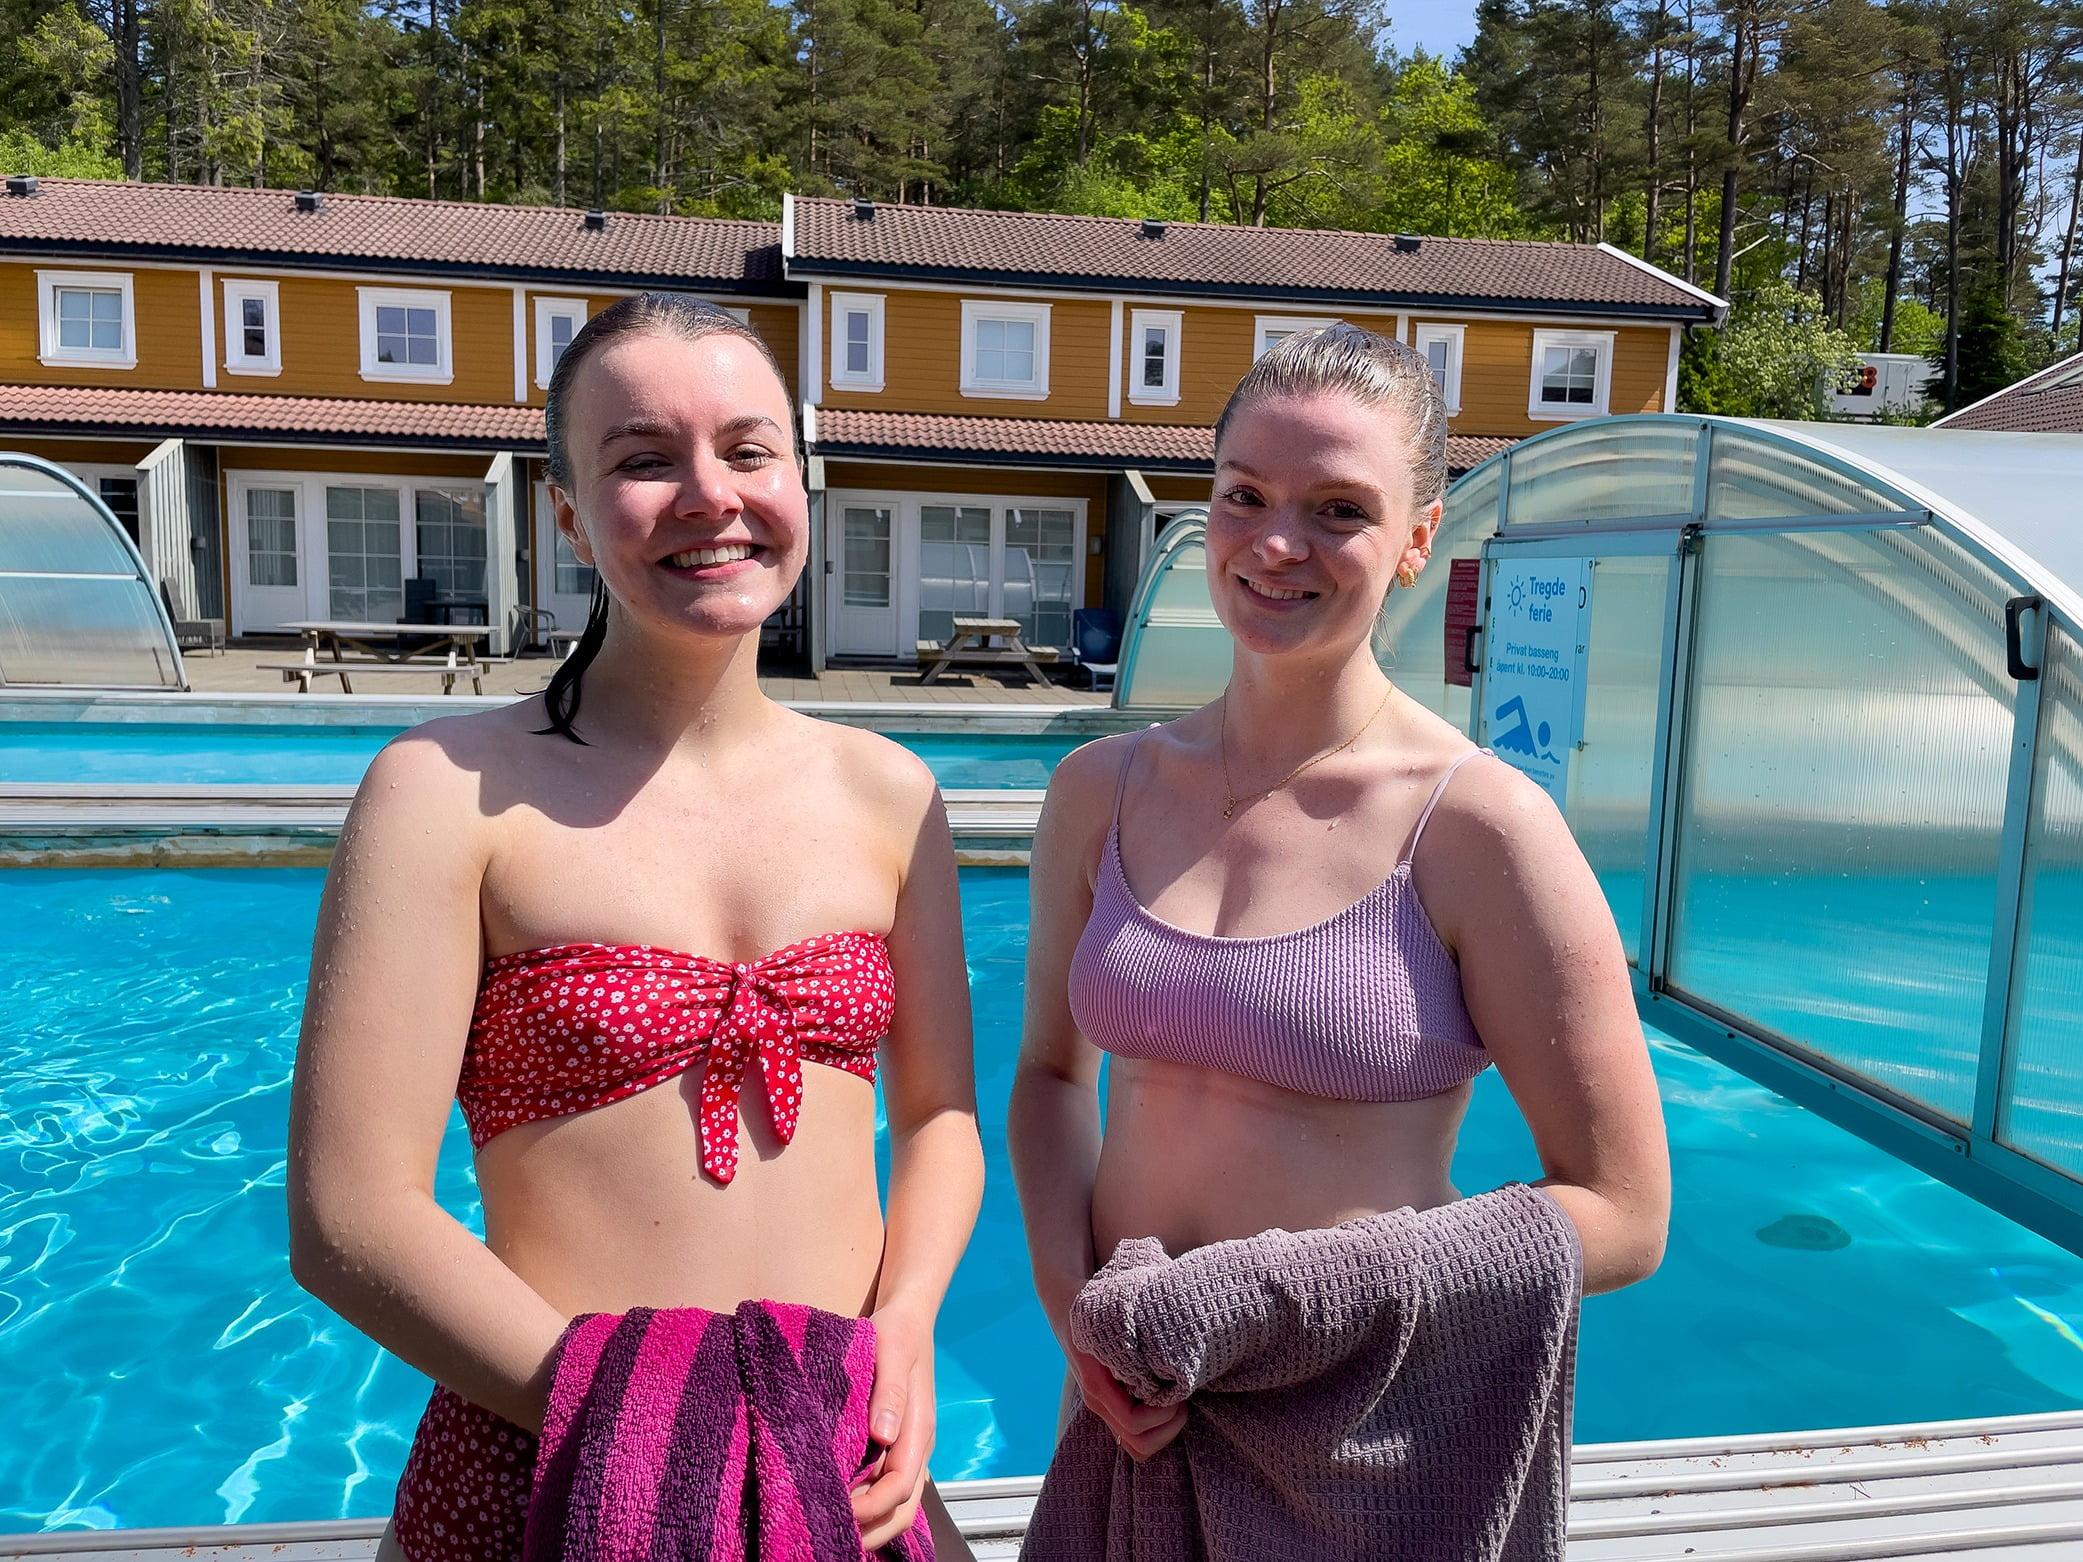 Swimming pool, Smile, Water, Window, Blue, Swimwear, Waist, Happy, Thigh, Travel